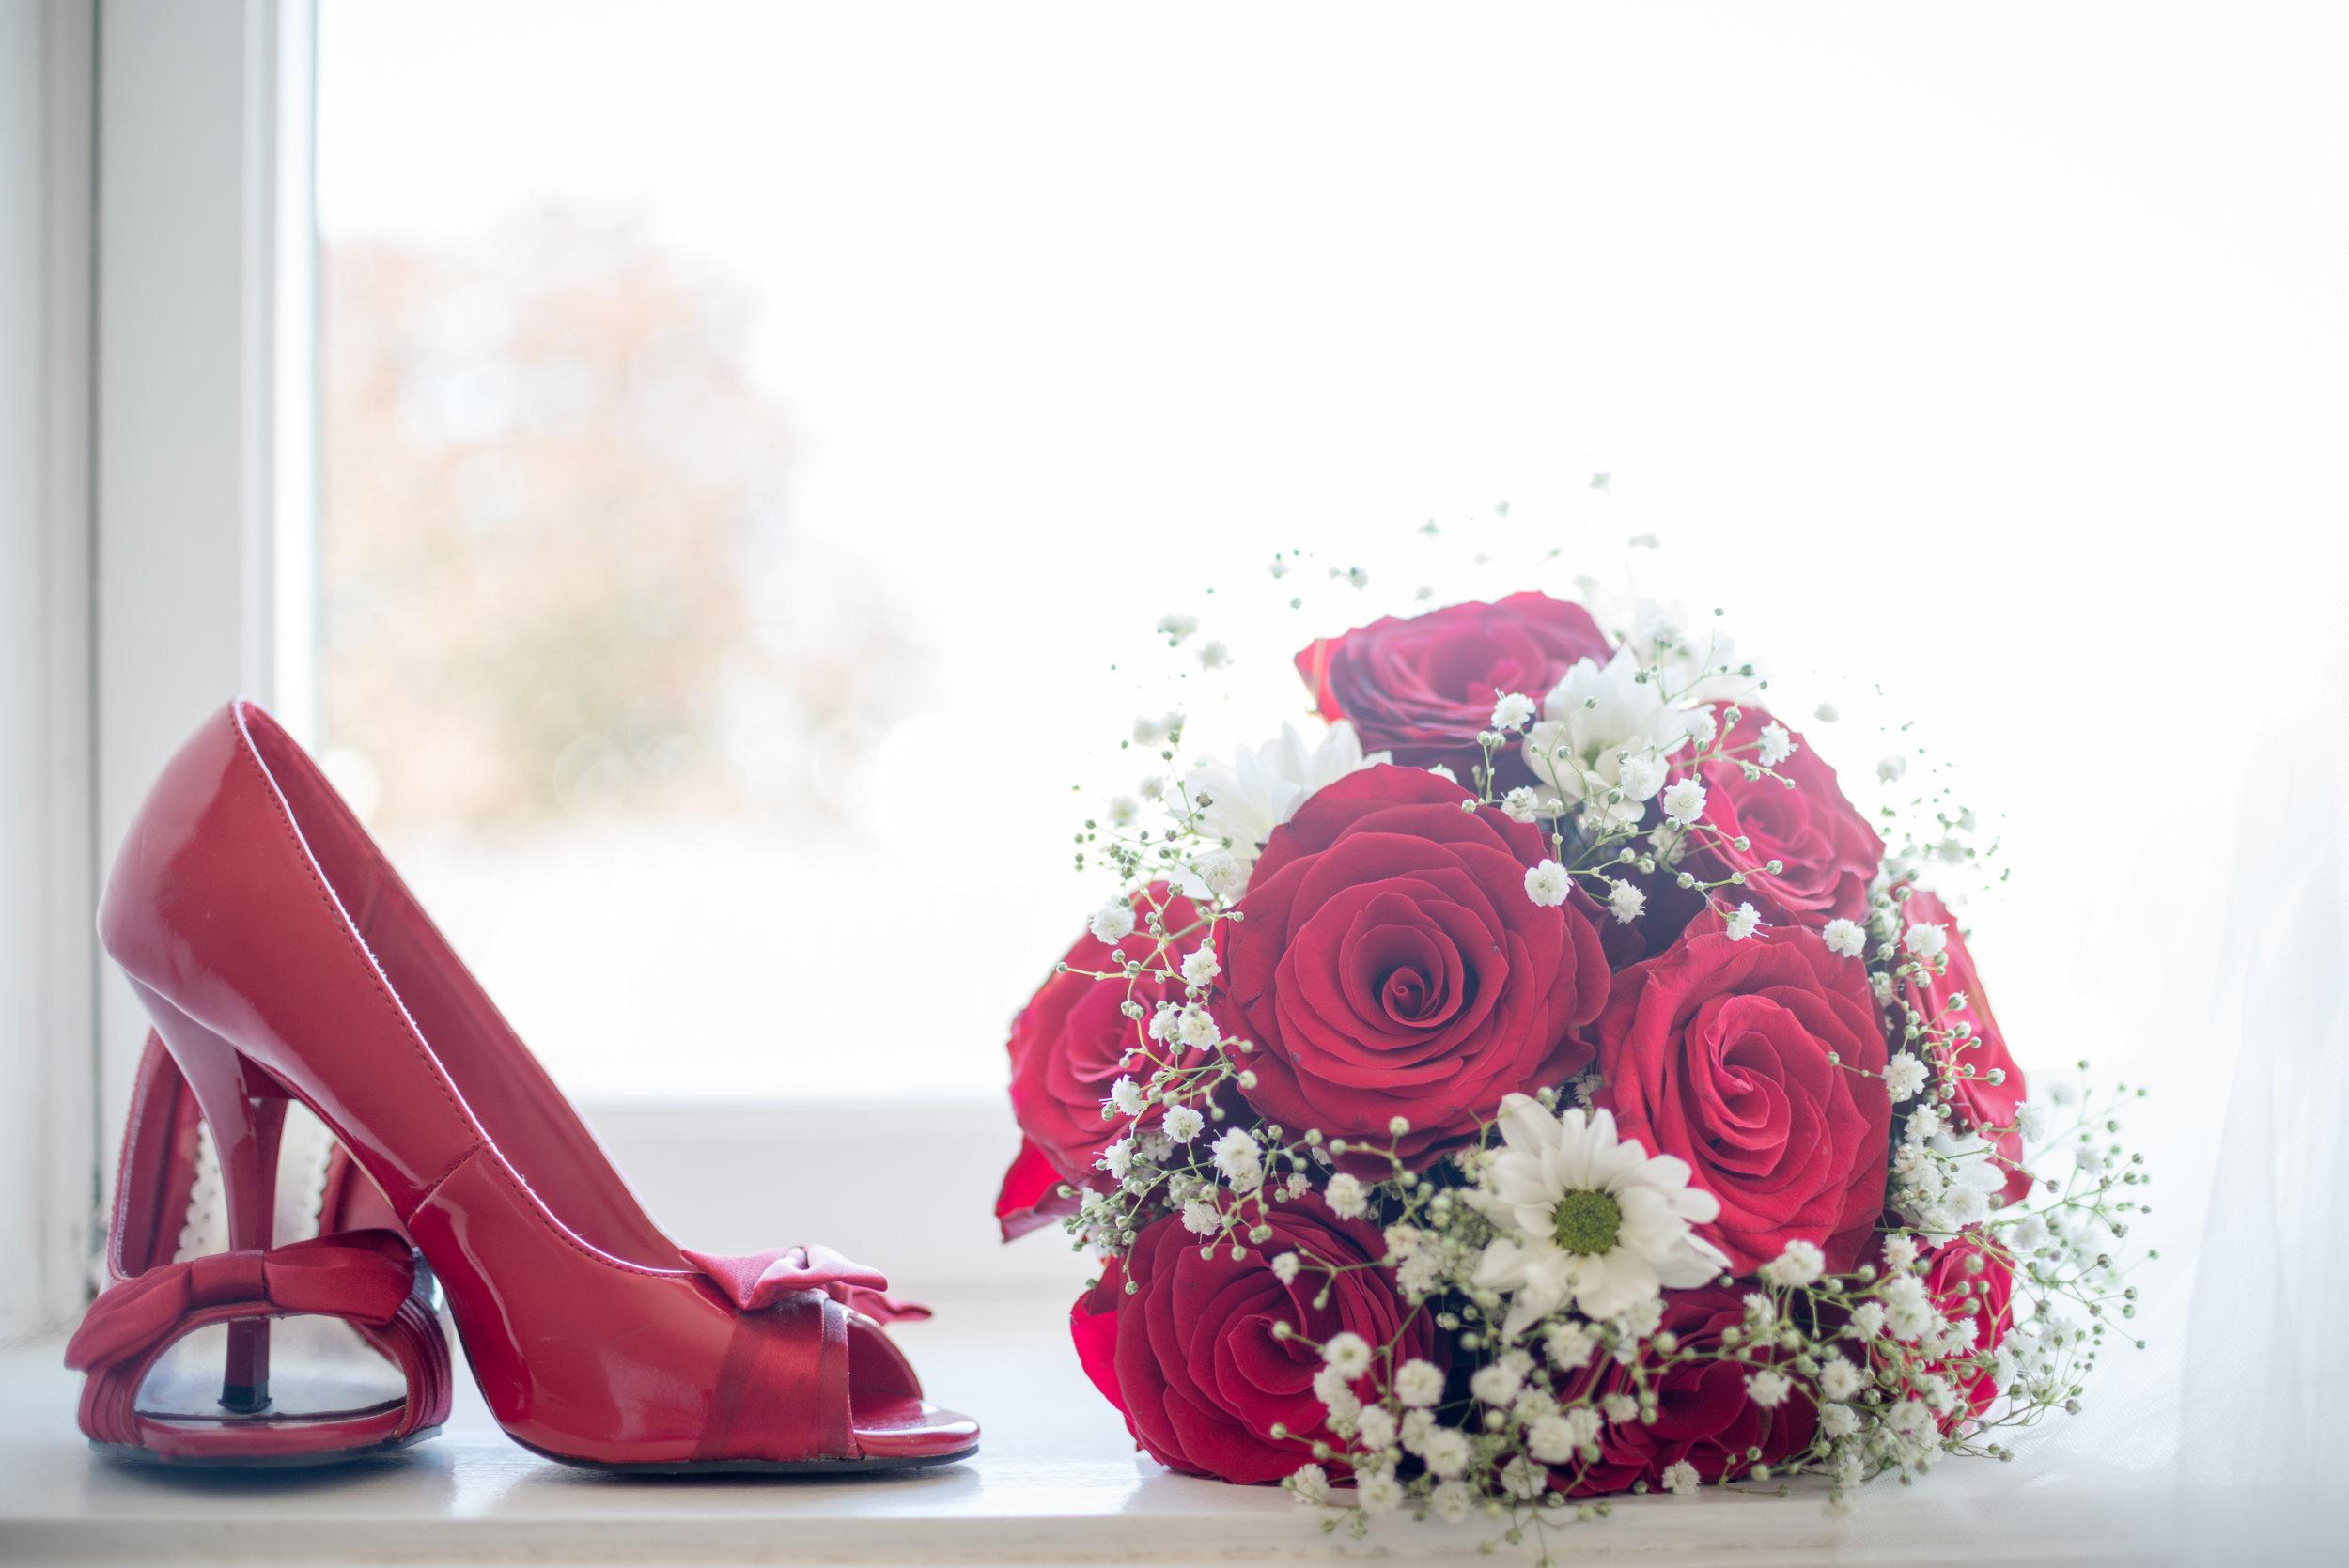 Wedding shoes and bouquet details guillem Cheung Stavanger bryllup